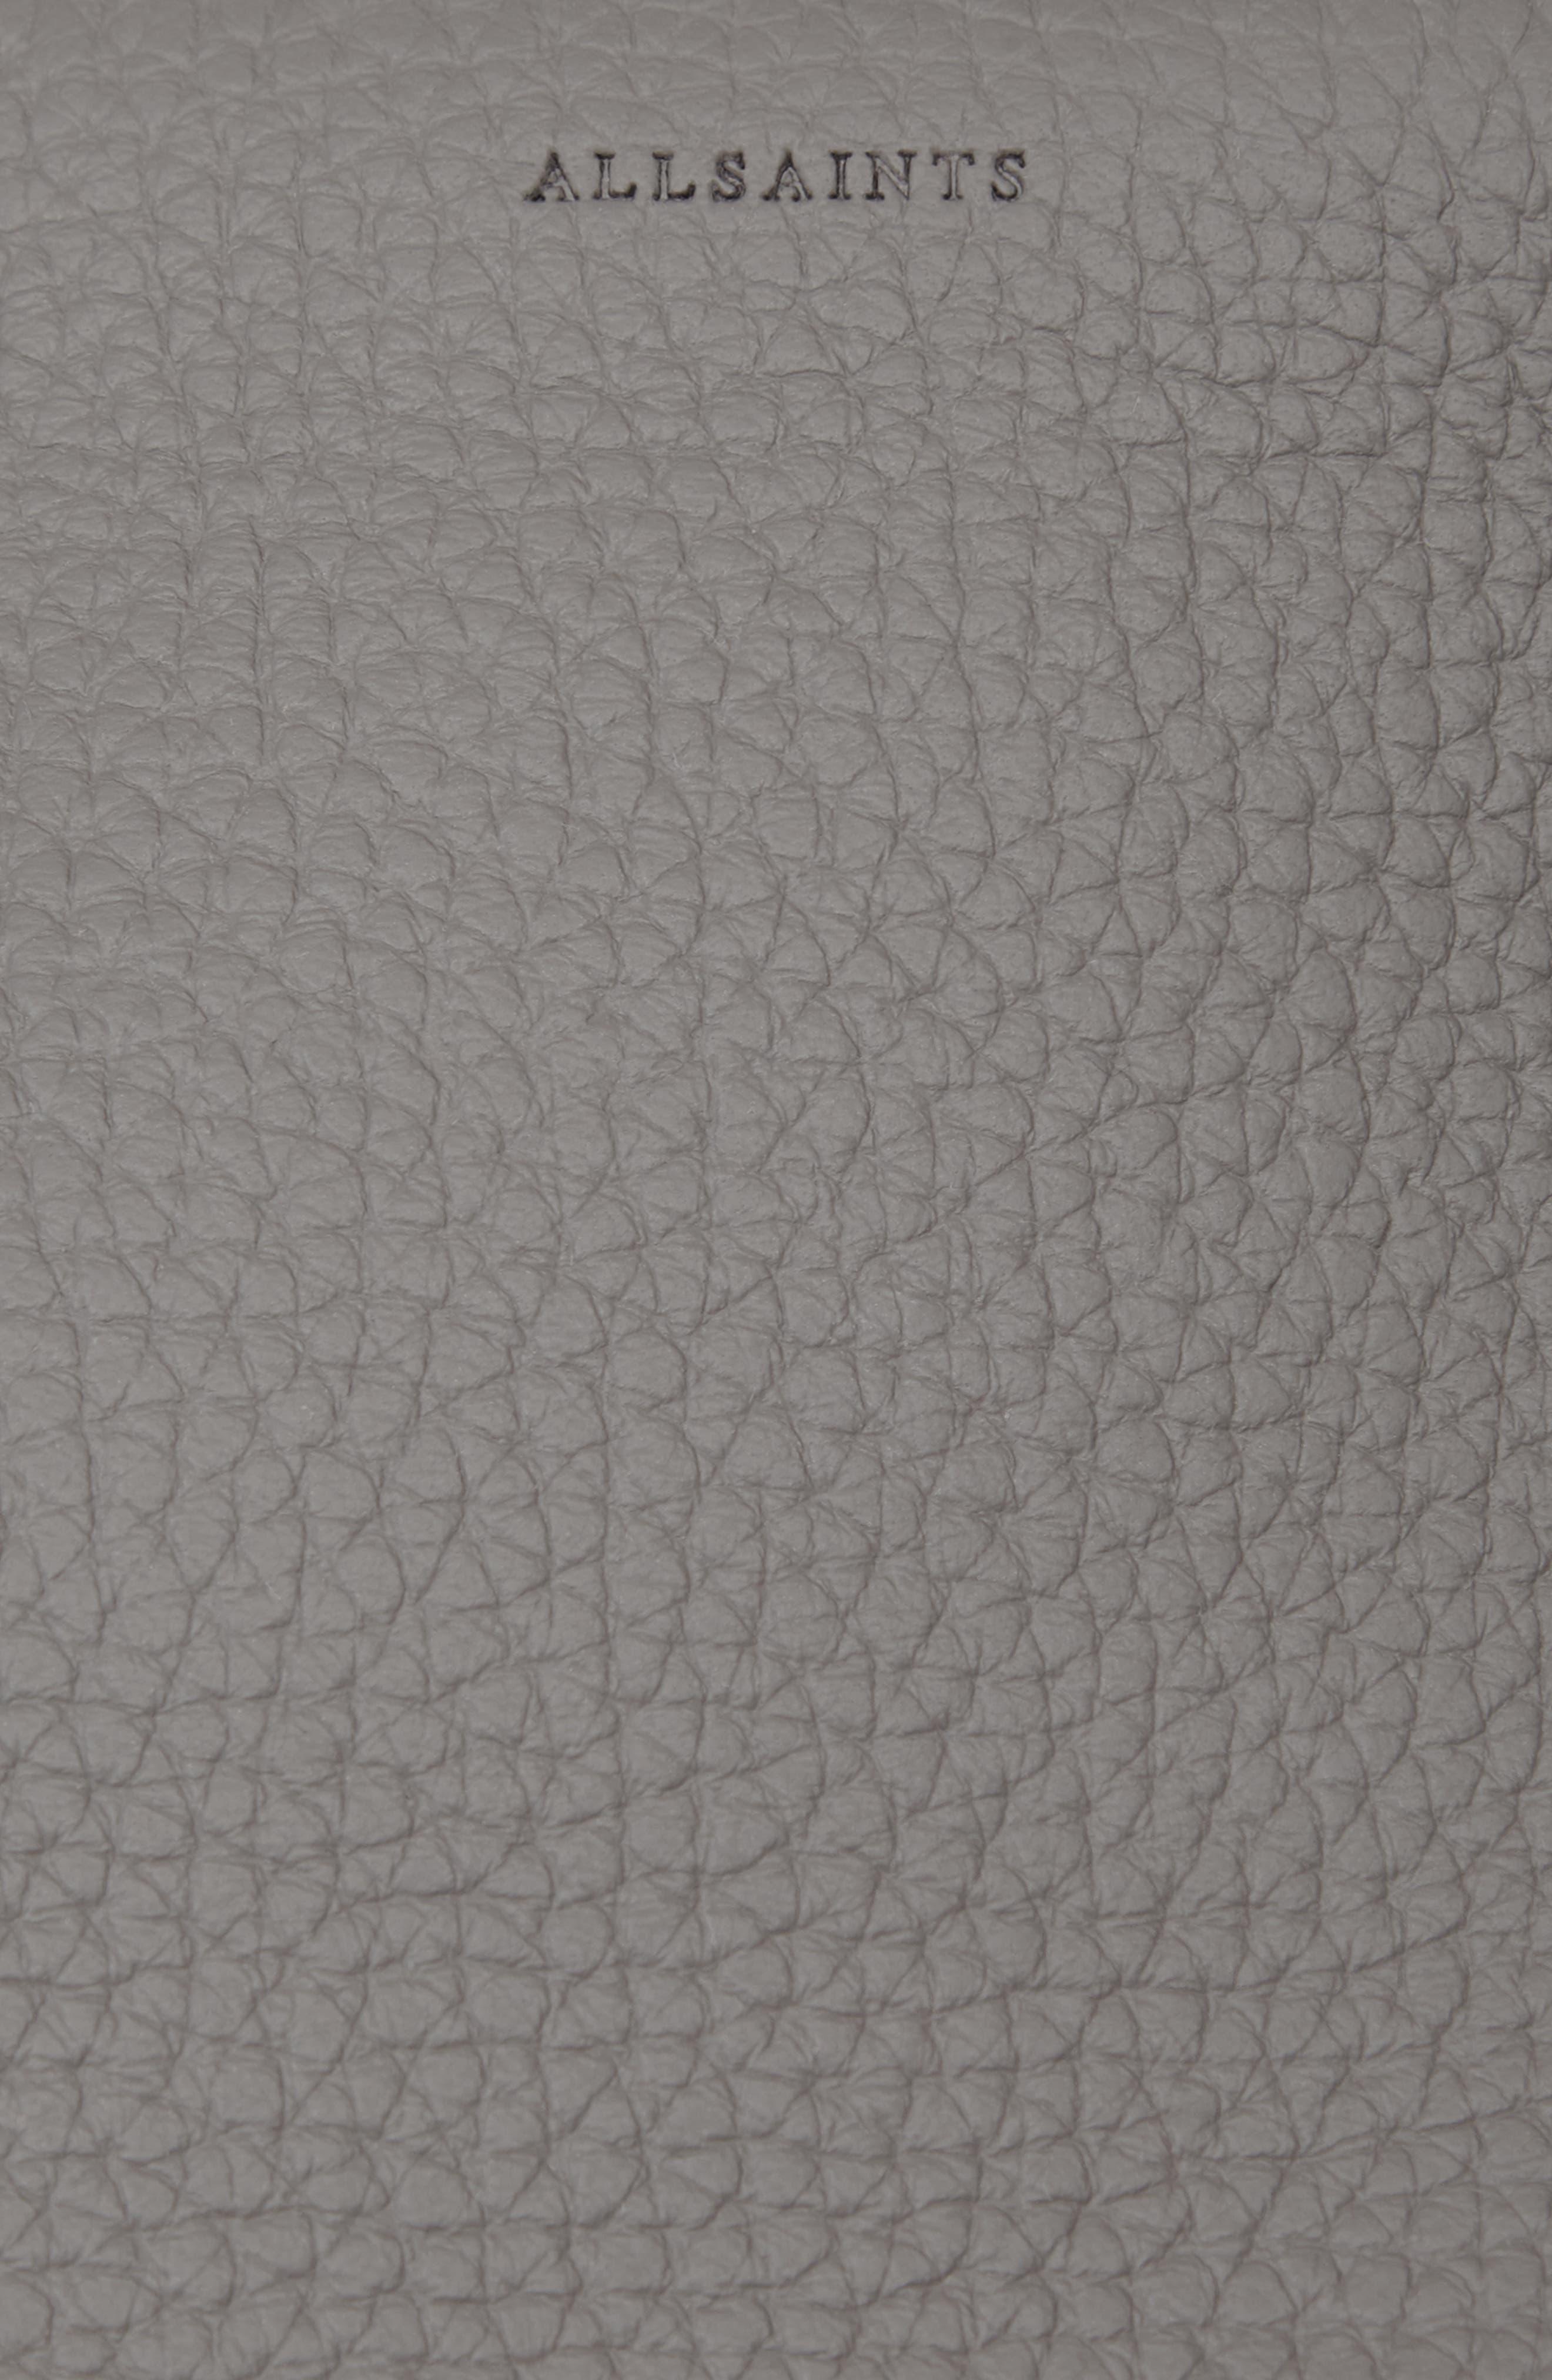 ALLSAINTS, Small Kita Convertible Leather Backpack, Alternate thumbnail 6, color, STORM GREY